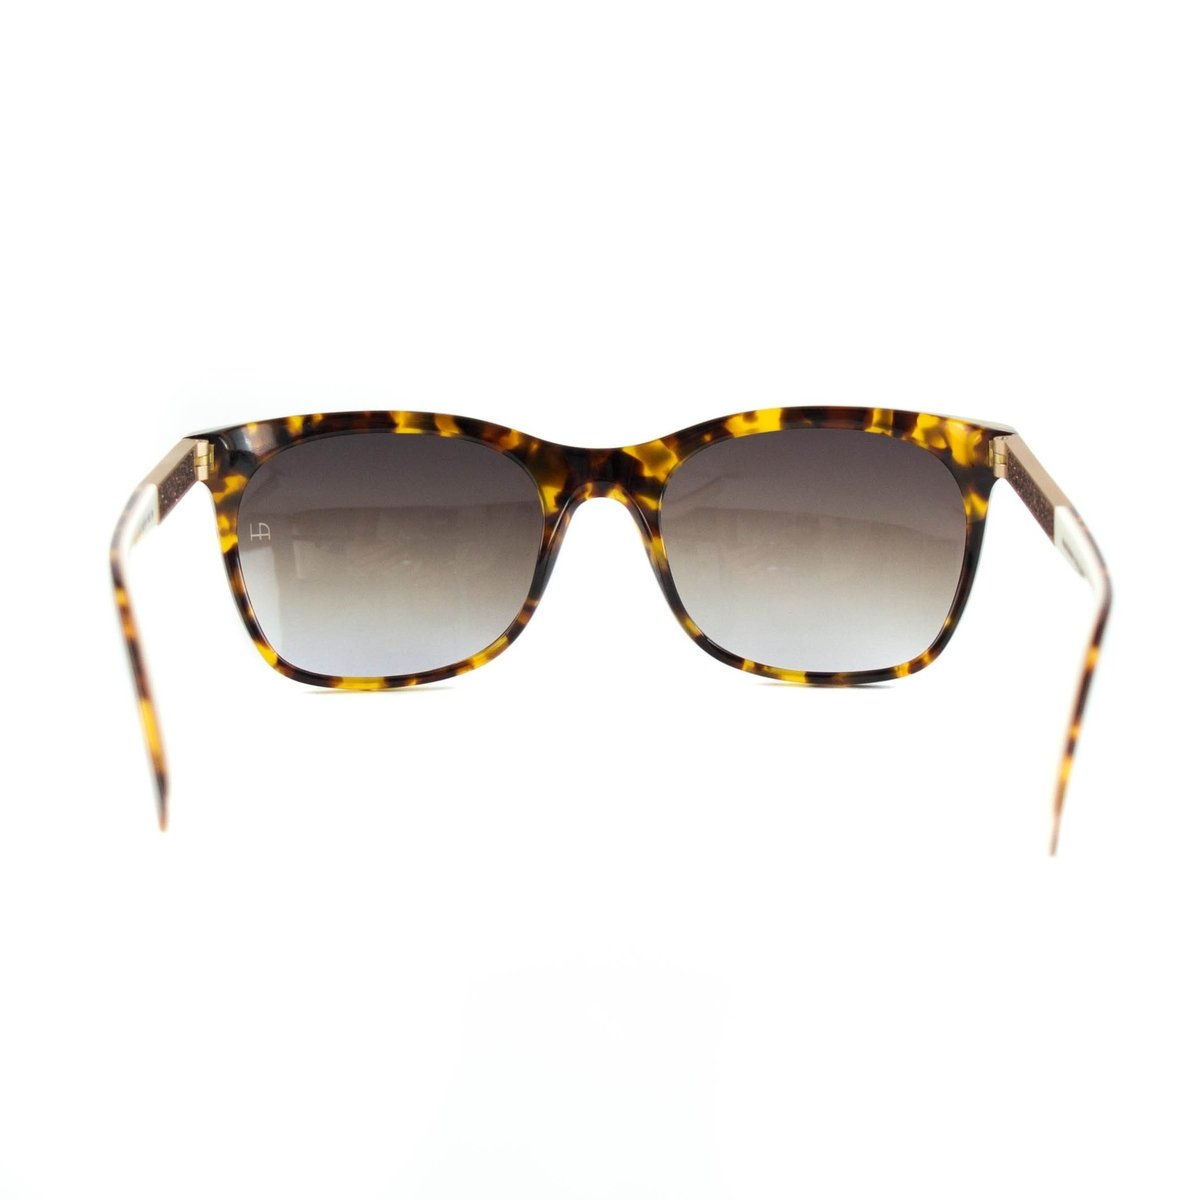 3146d12c86eec Óculos de Sol Ana Hickmann - Marrom - Compre Agora   Netshoes